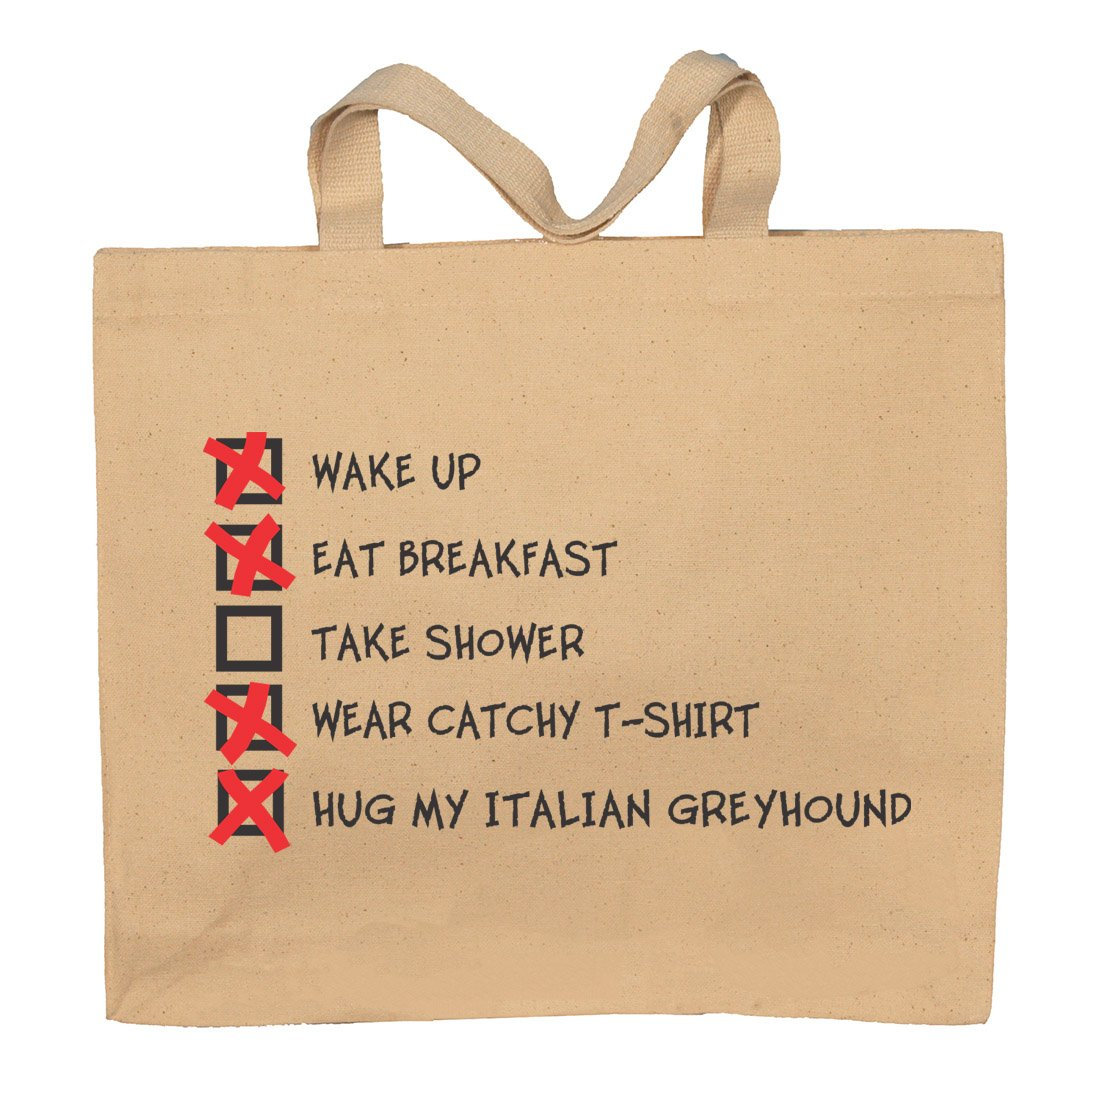 Hug My Italian Greyhound Checklist Totebag Bag